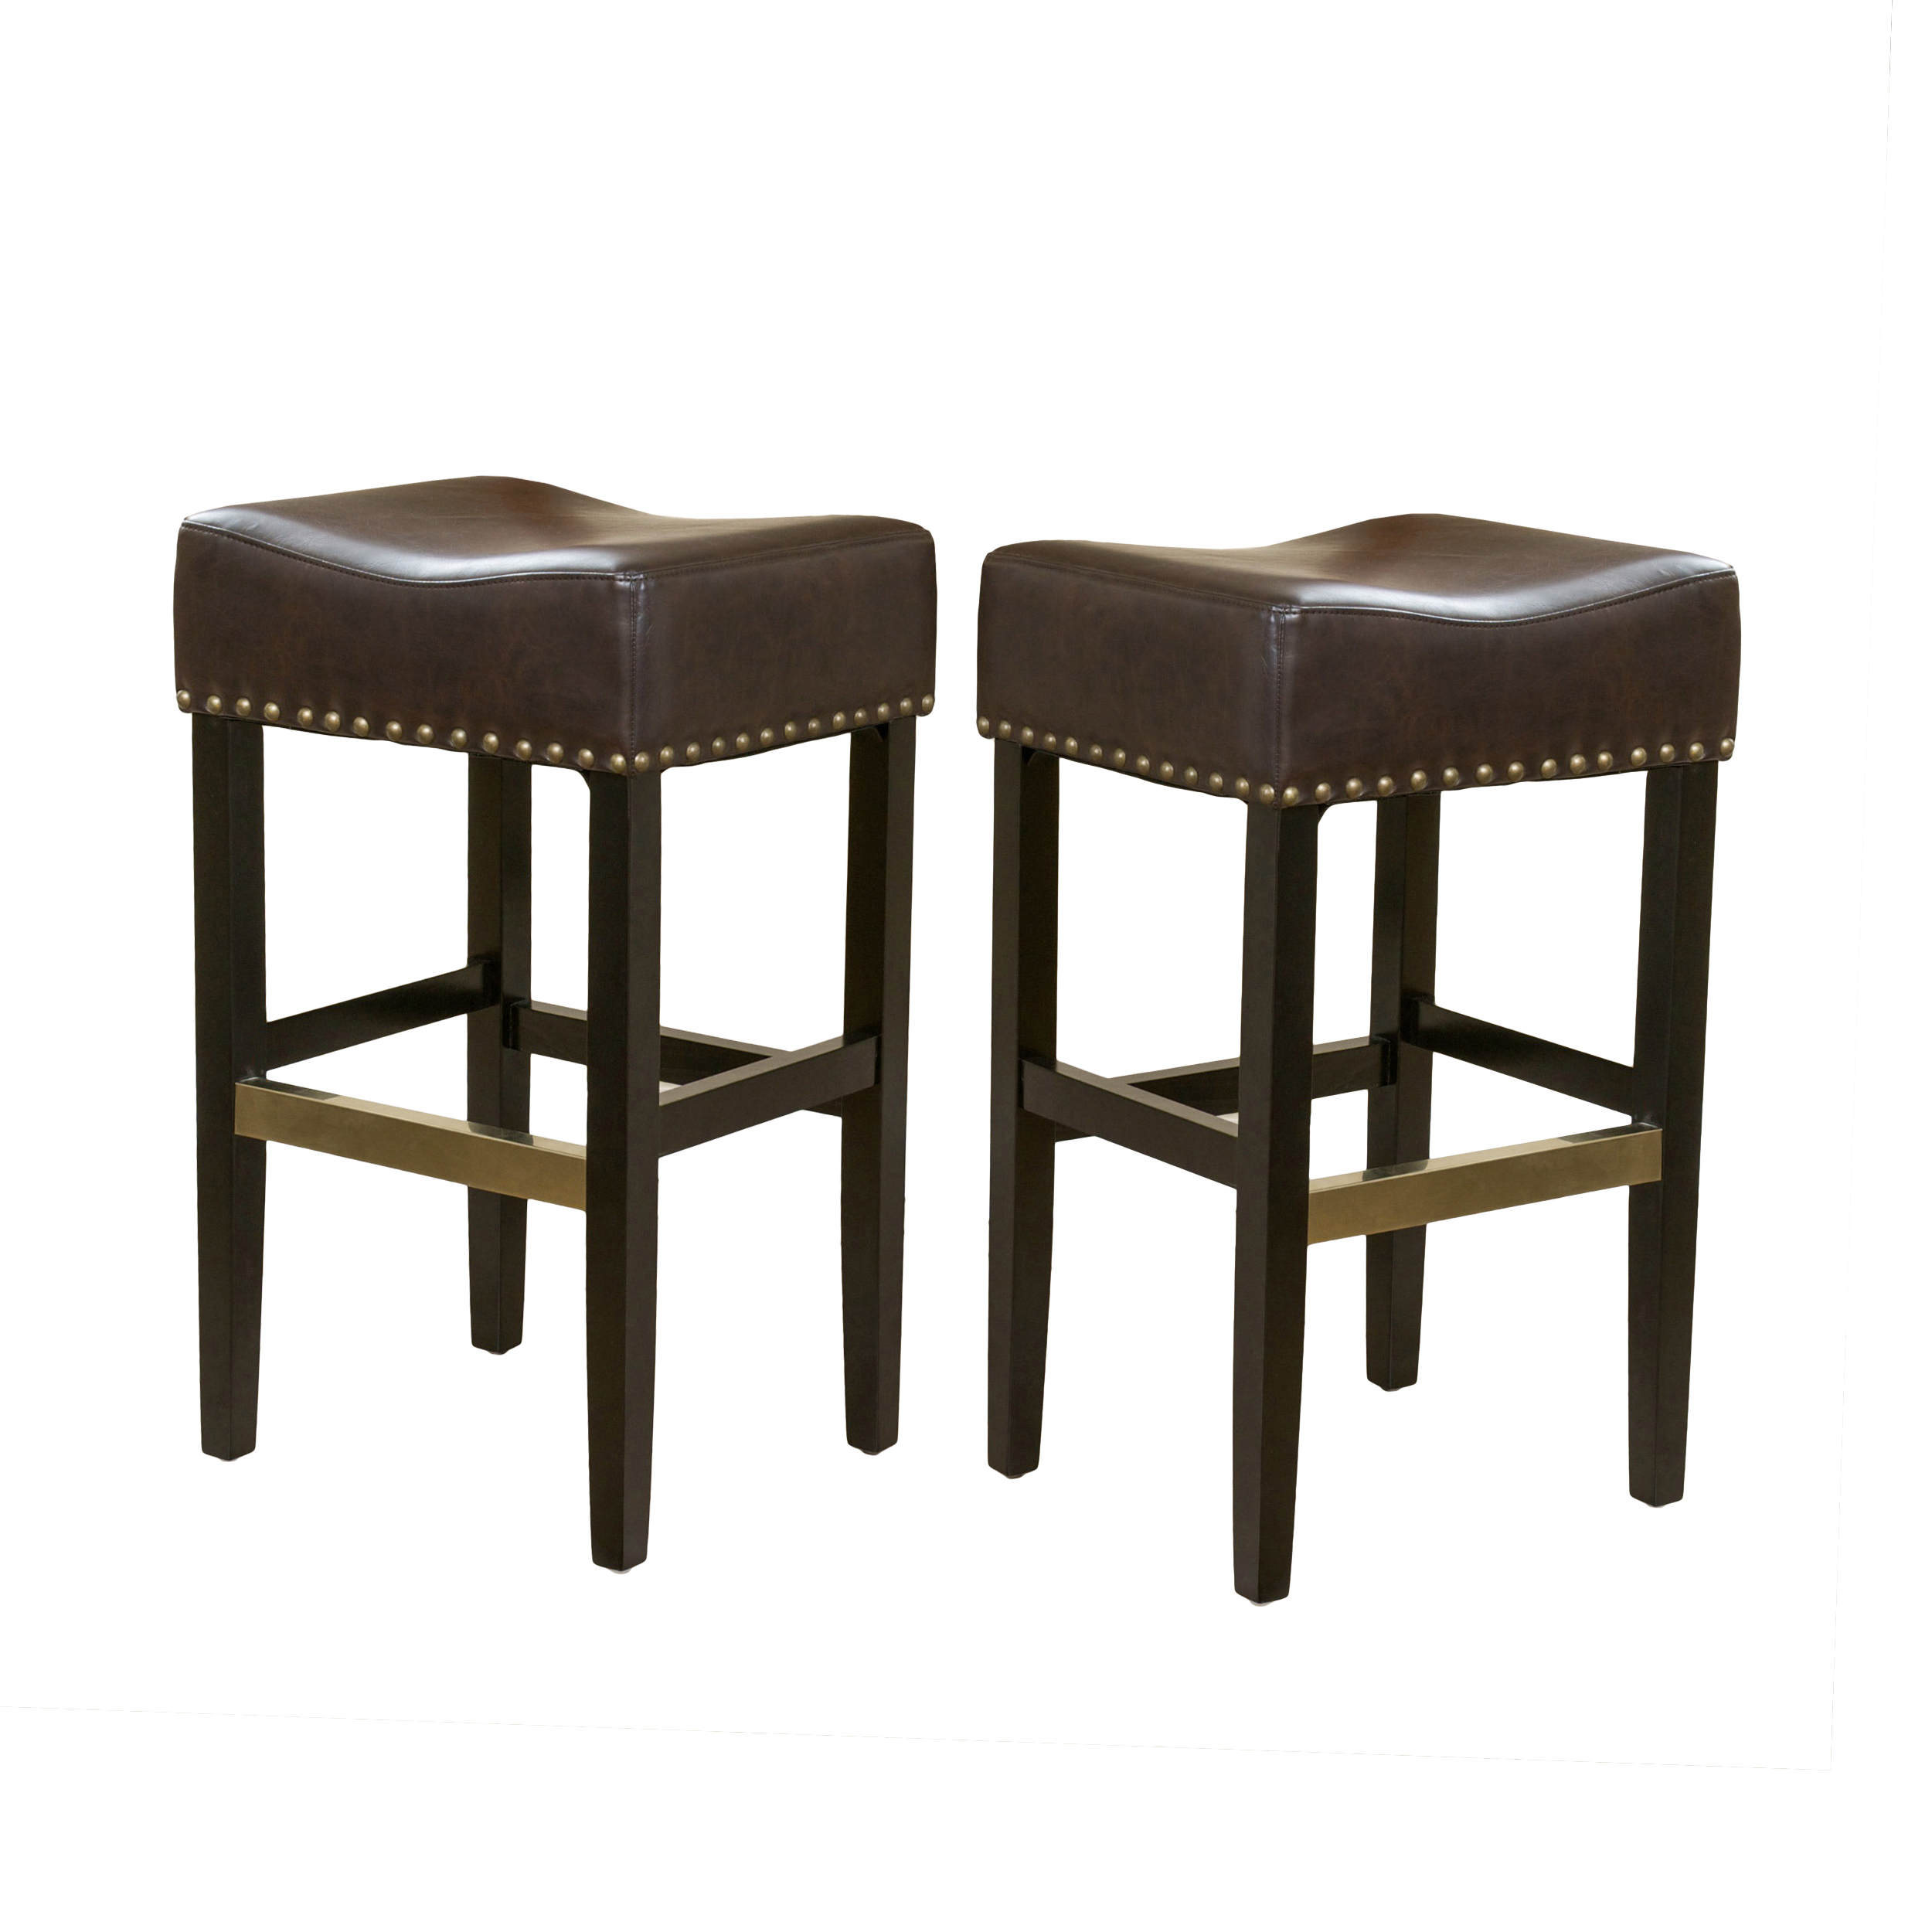 Kitchen Bar Stools Walmart: Erika Brown Backless Leather Bar Stool (Set Of 2